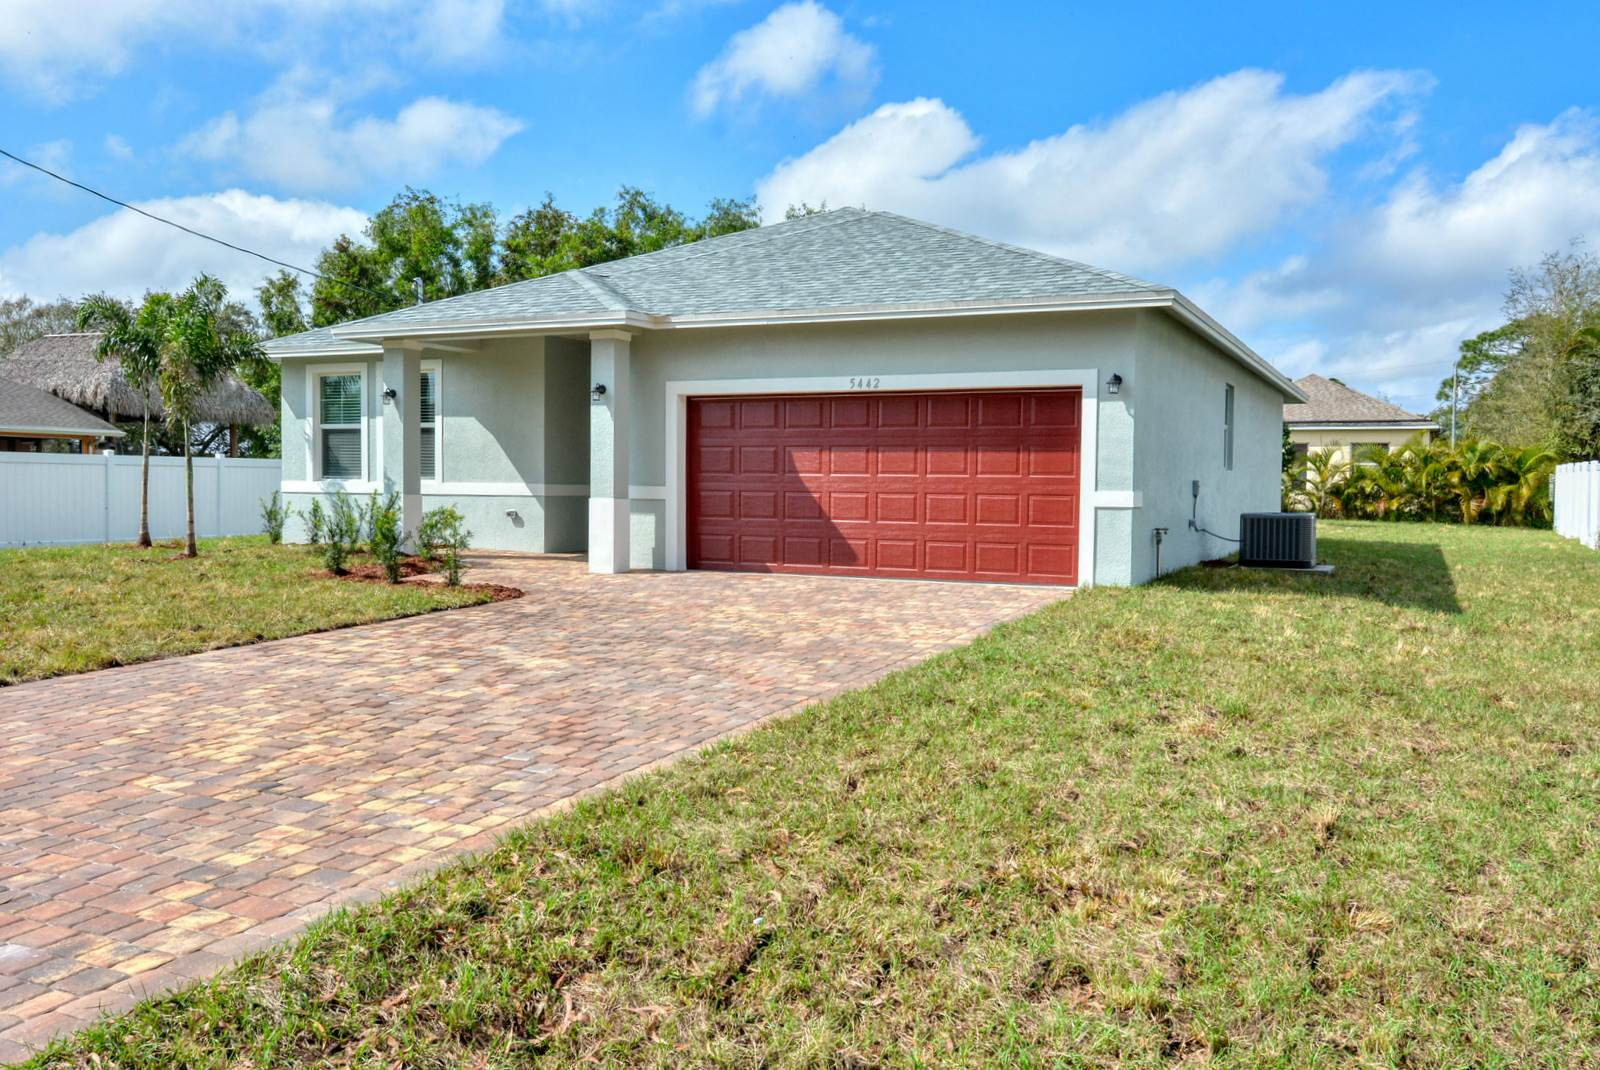 5290 NW Conley Drive, Port Saint Lucie, FL 34986